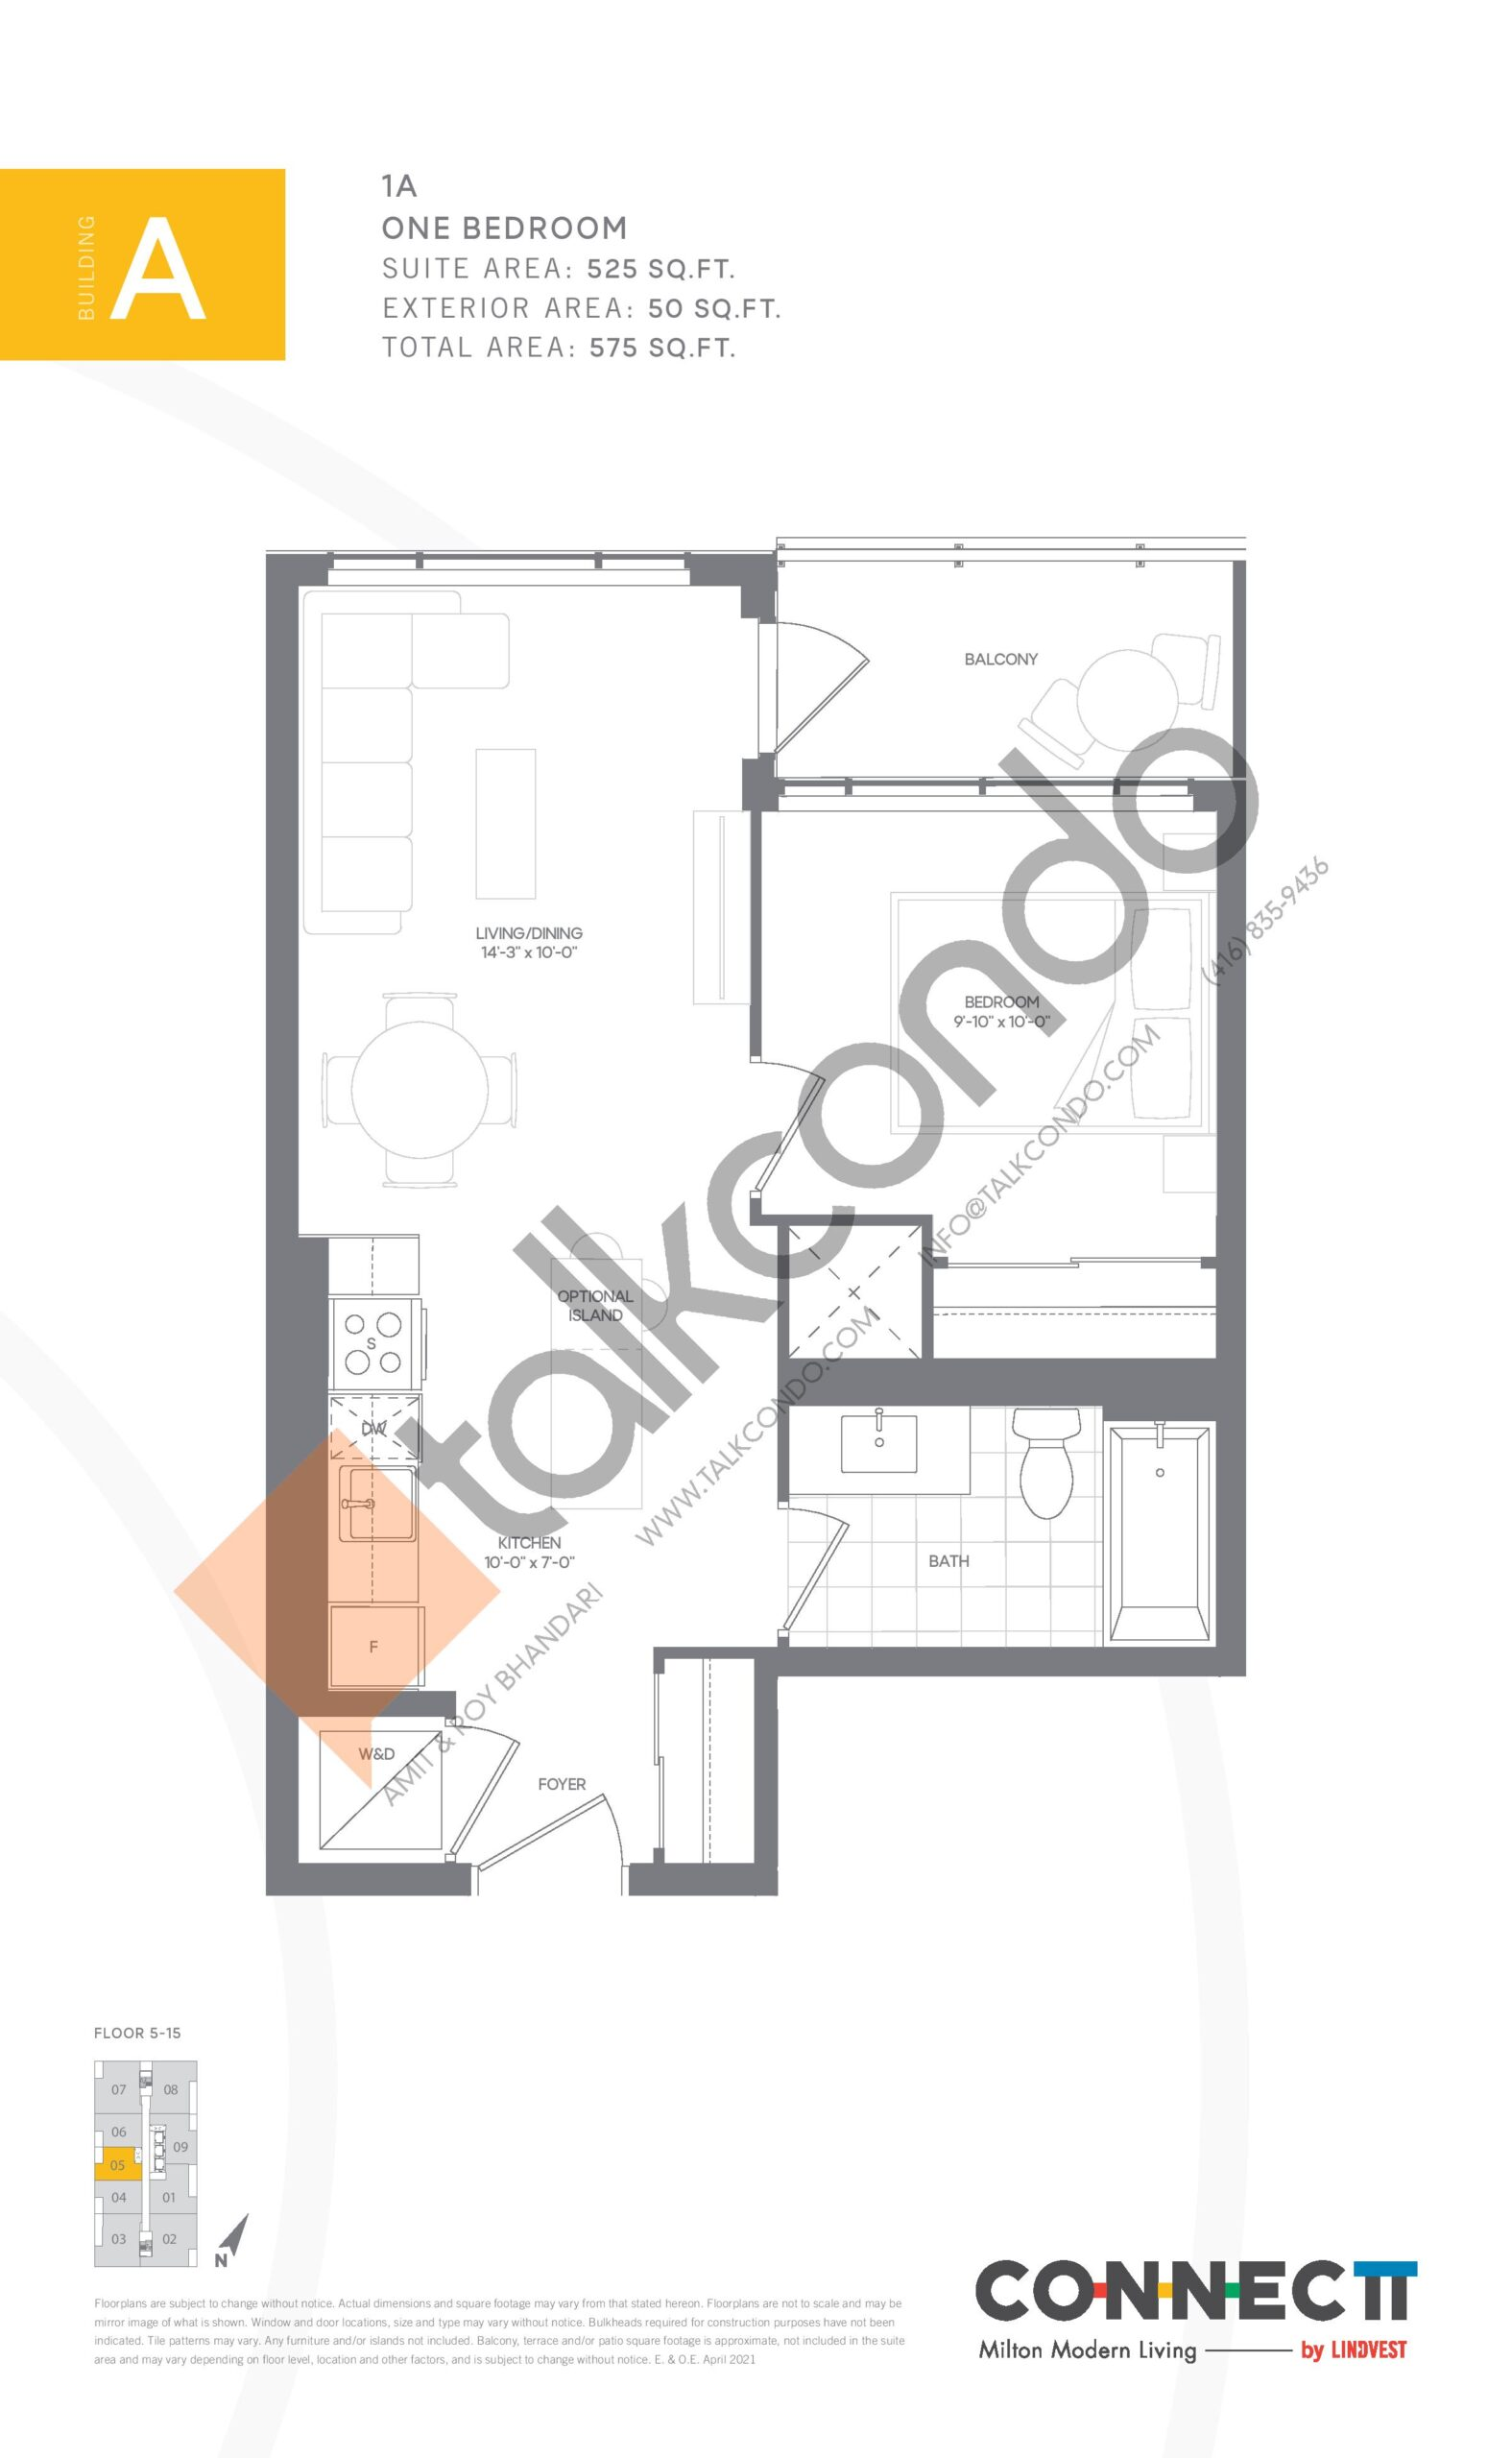 1A Floor Plan at Connectt Urban Community Condos - 525 sq.ft